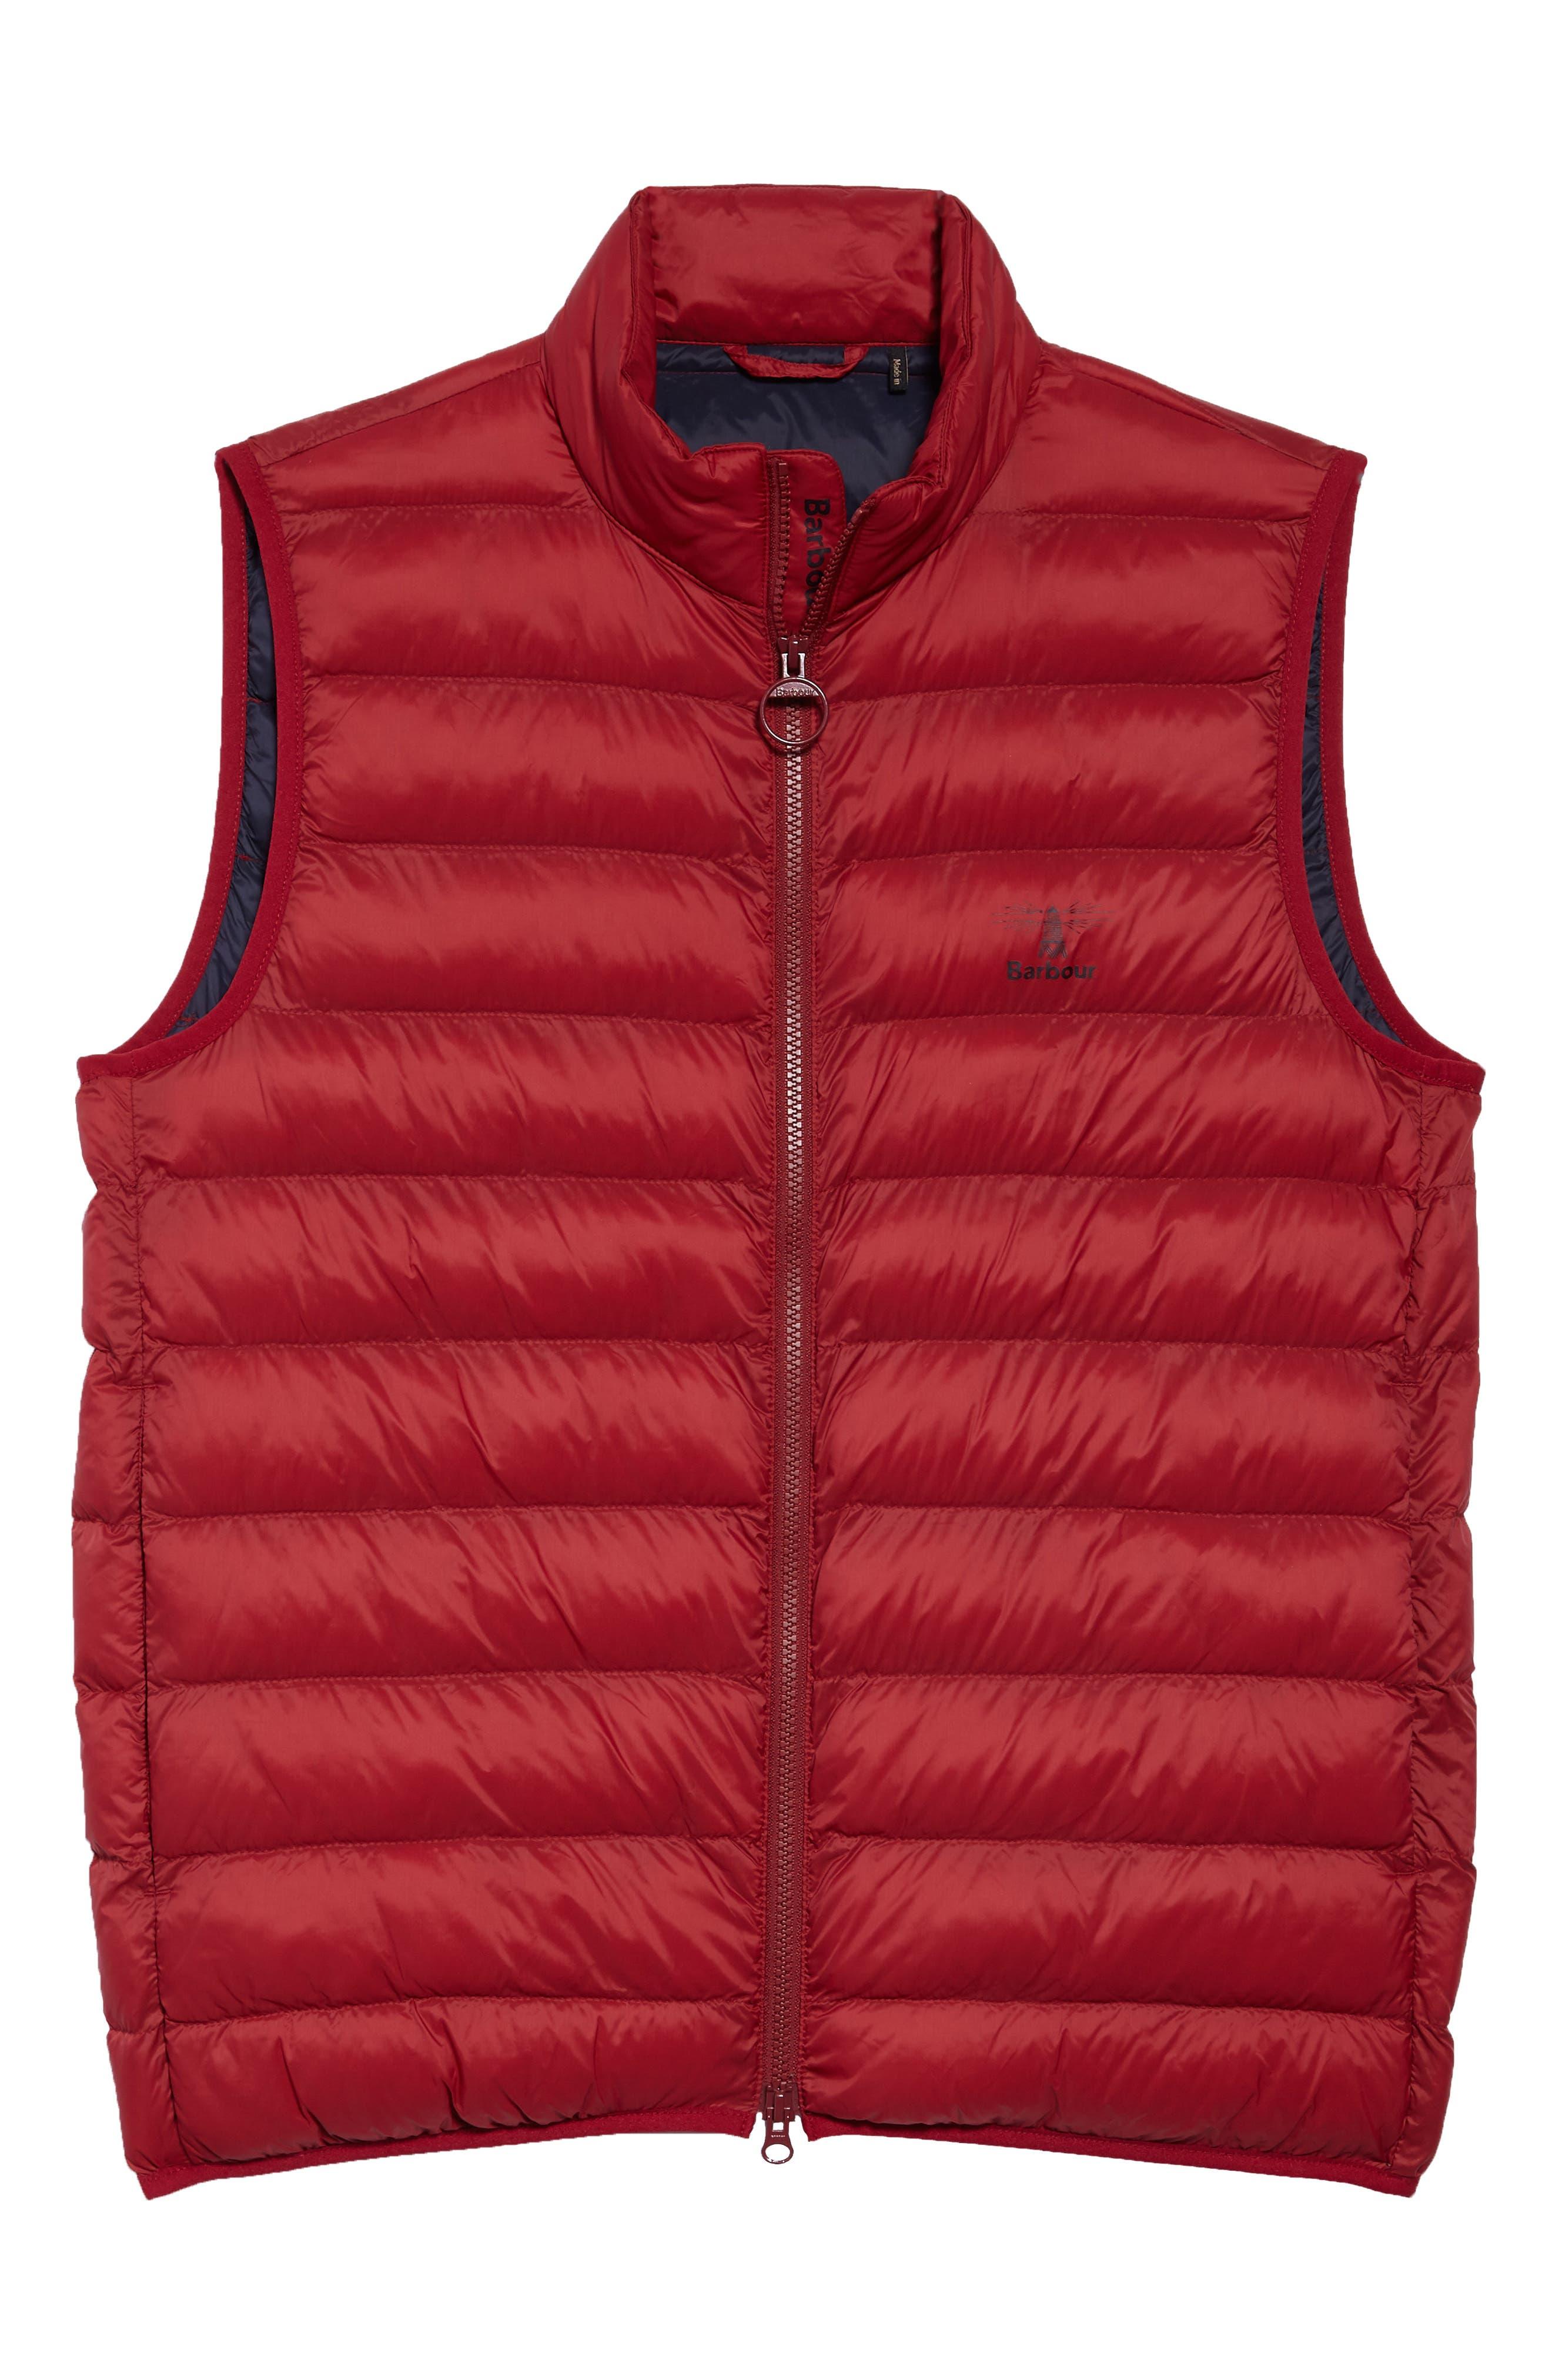 Askham Quilted Vest,                             Alternate thumbnail 6, color,                             Biking Red